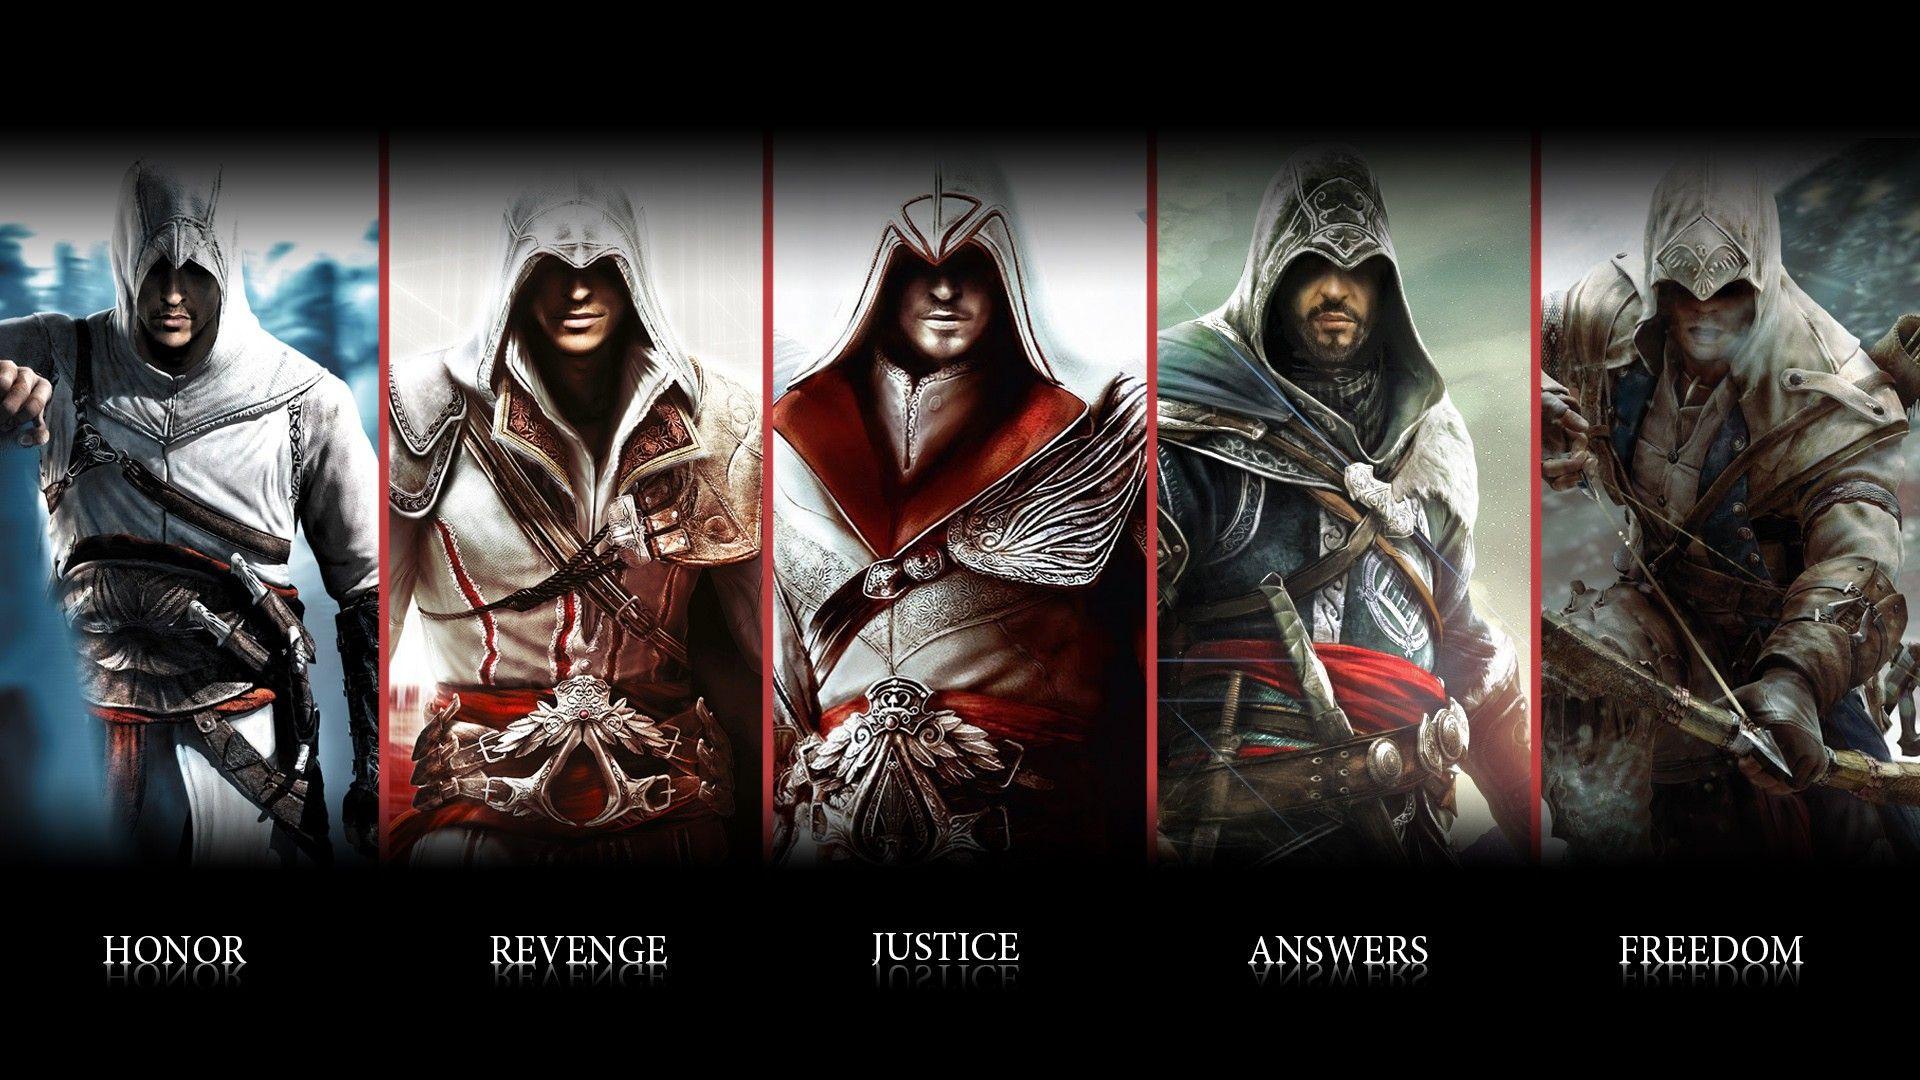 Assassins Creed Video Game HD Wallpaper FullHDWpp   Full HD 1920x1080